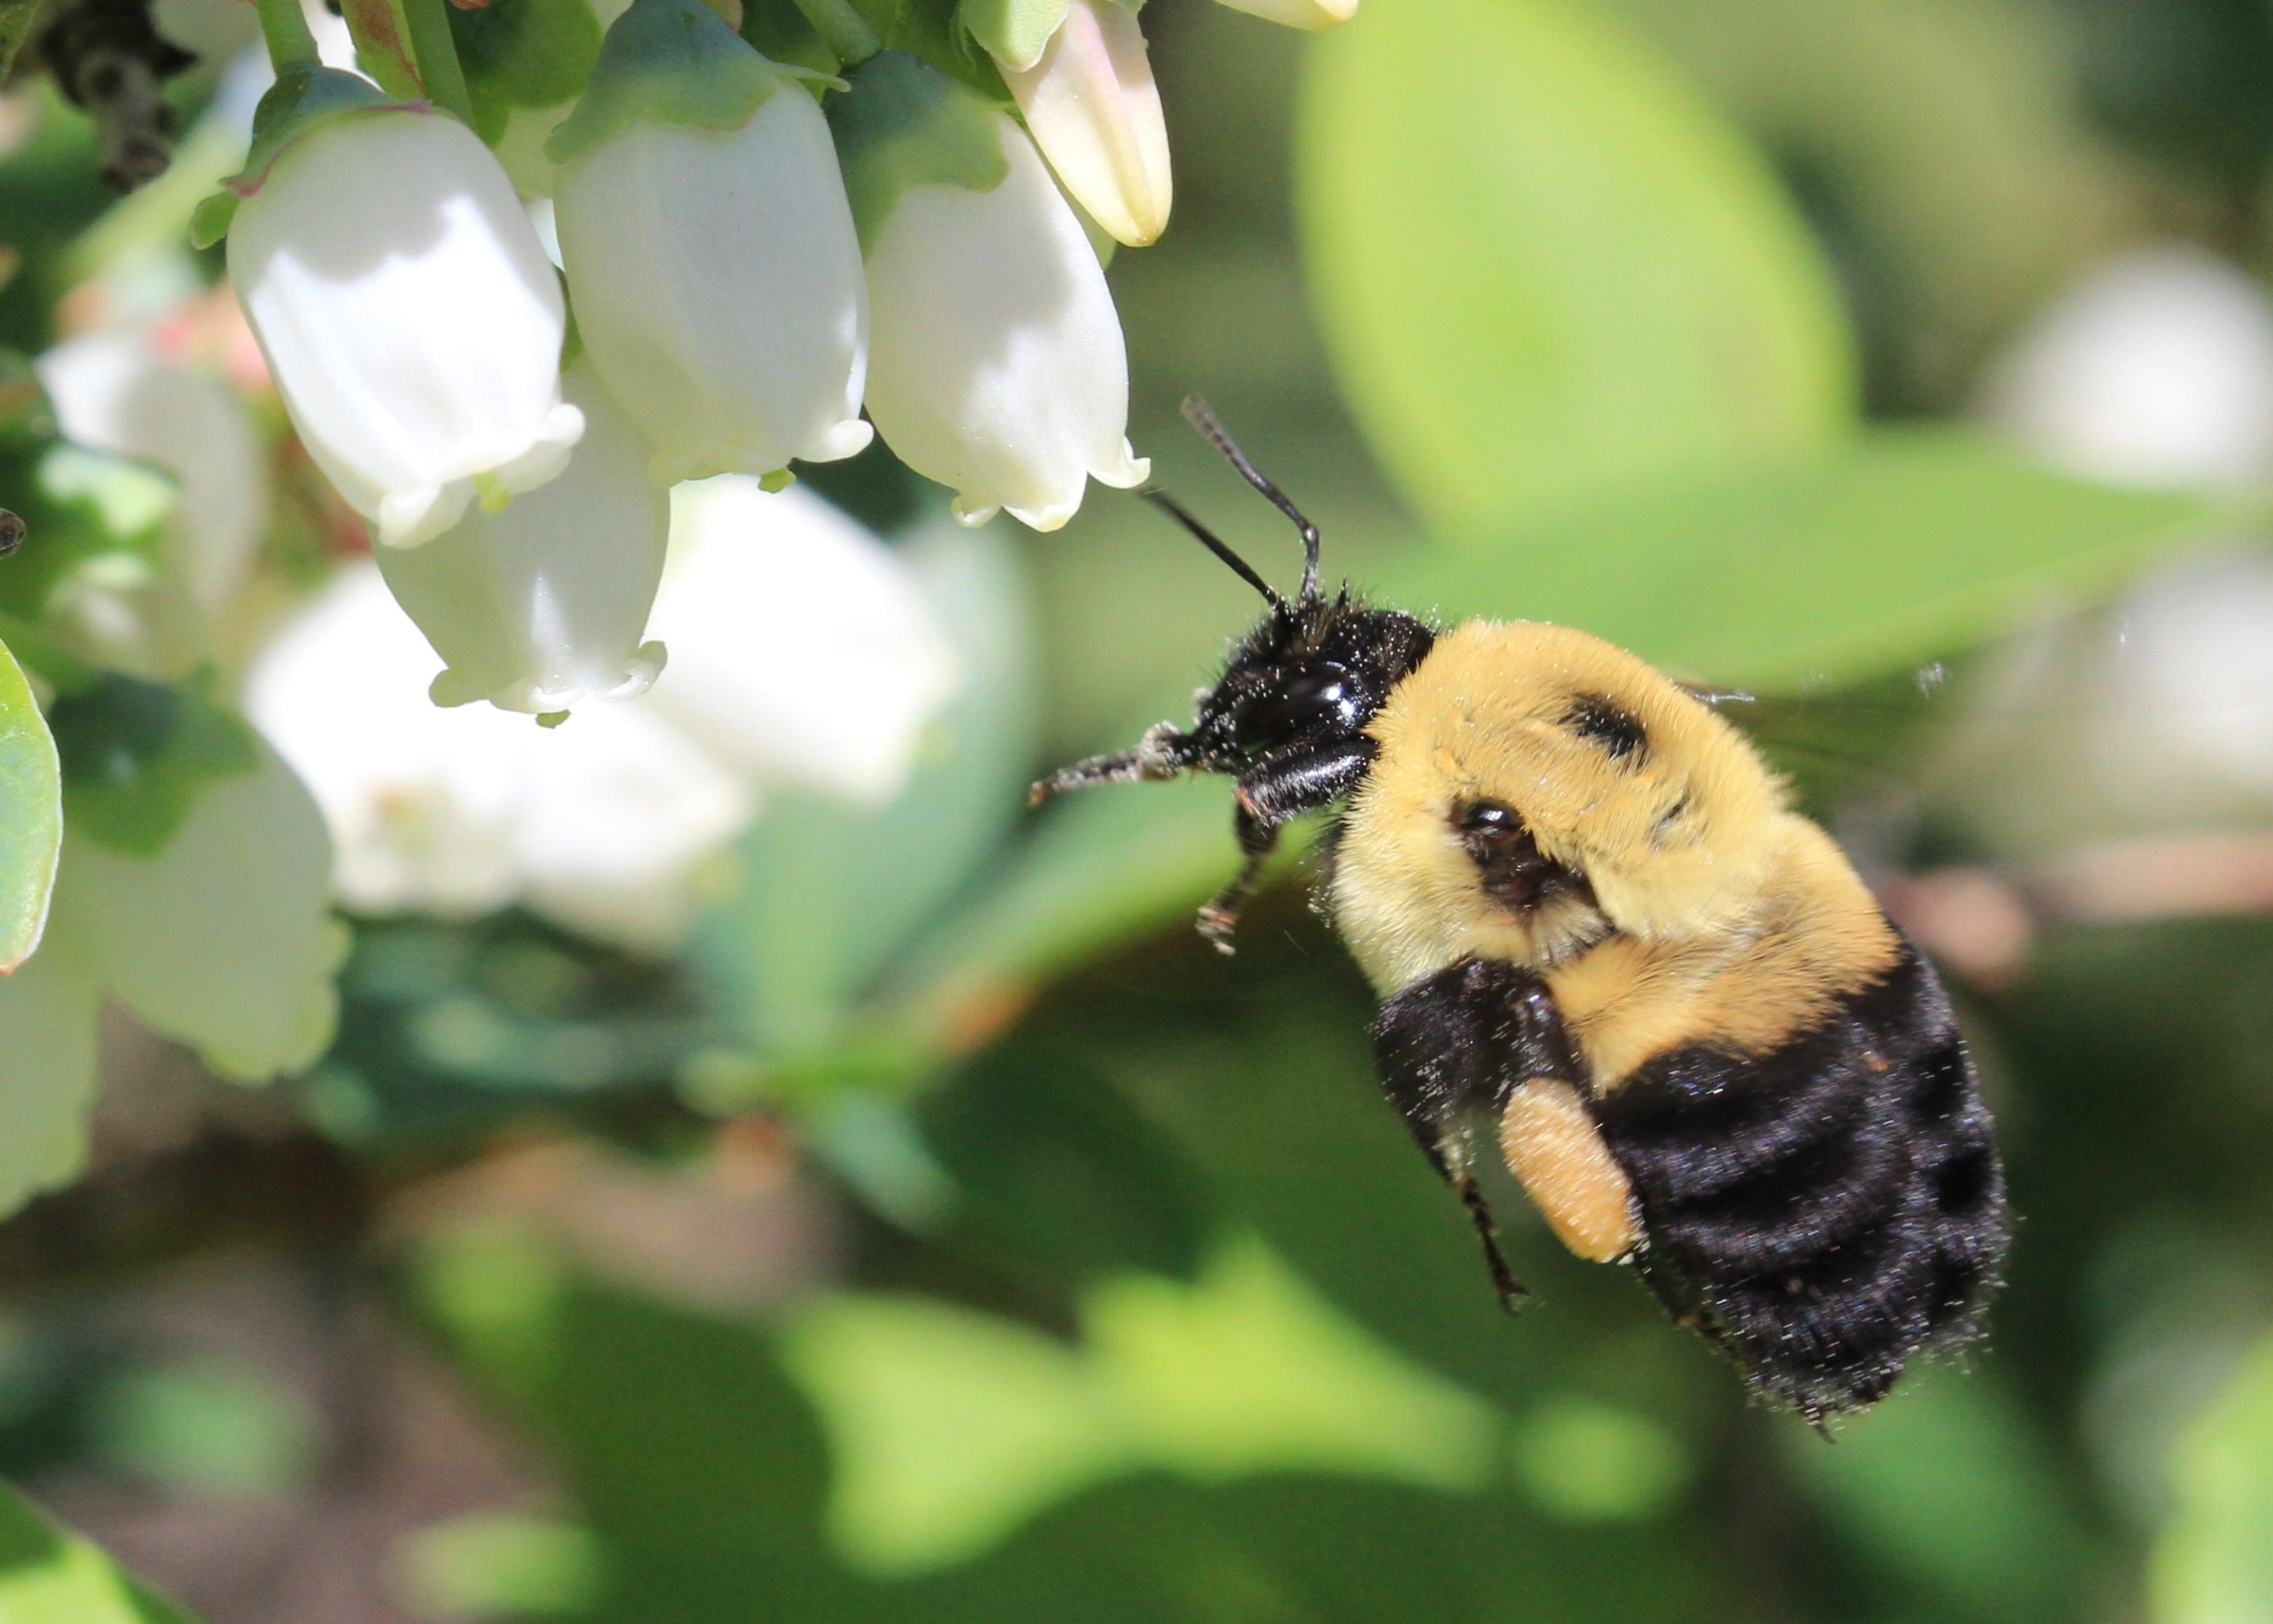 Bumble Bee Survey